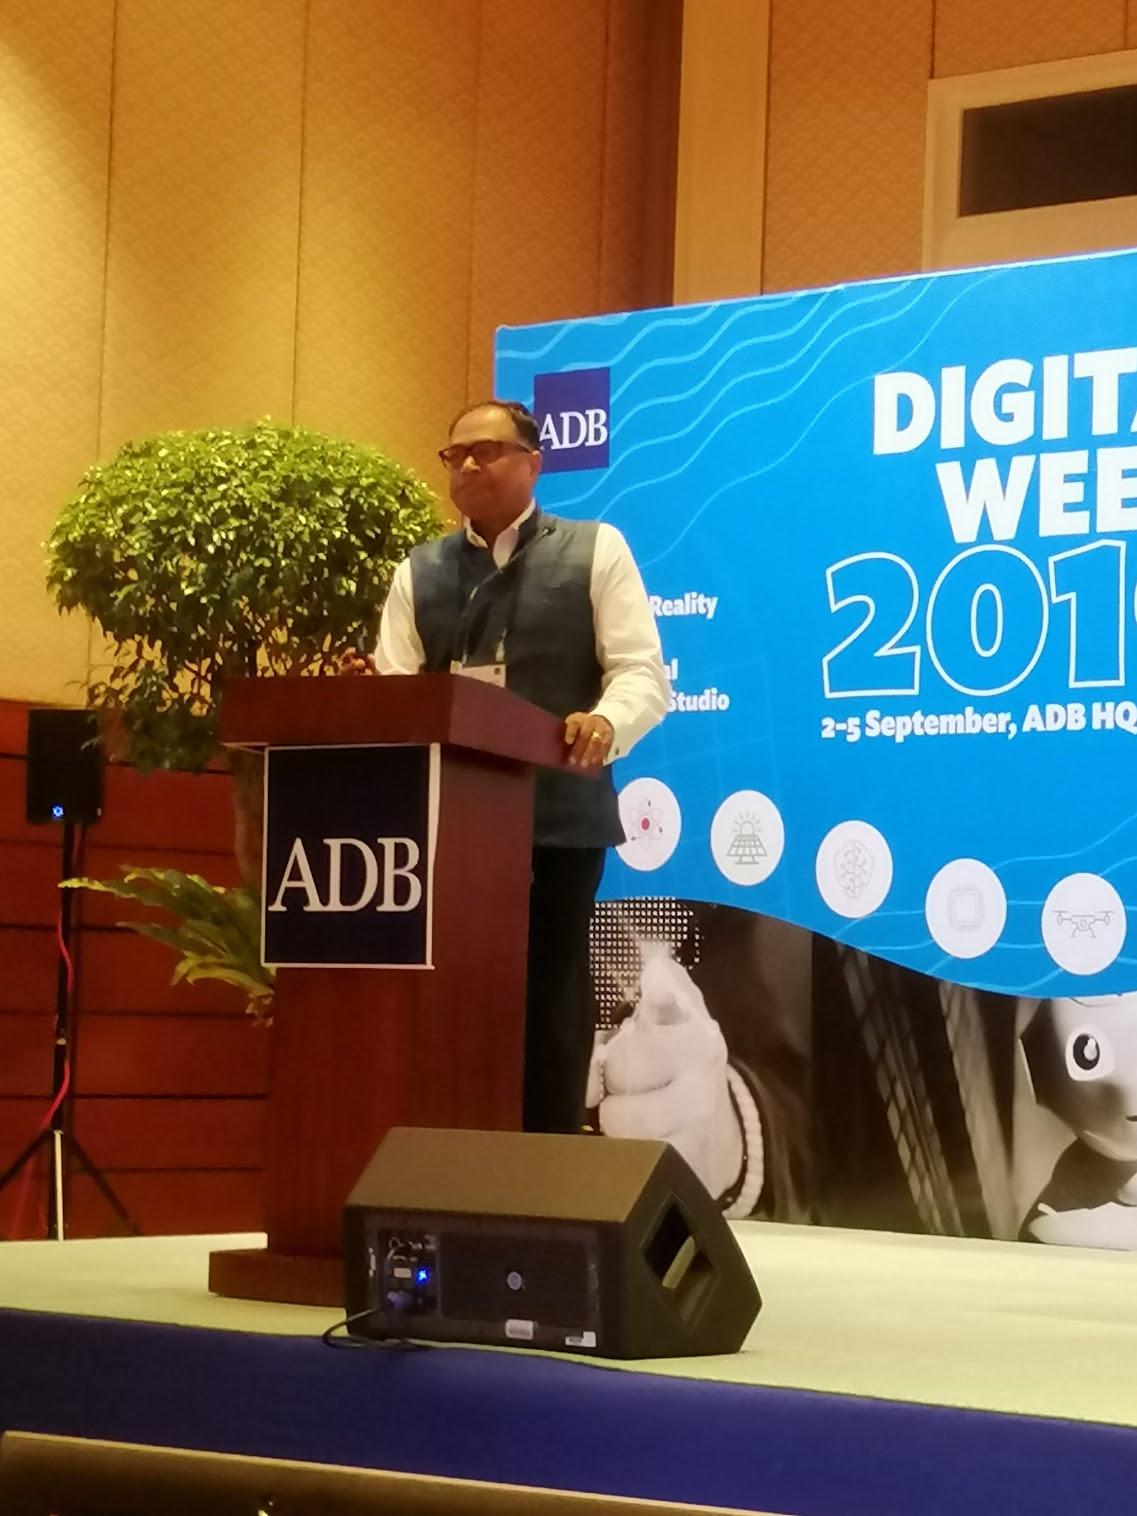 9:06 a.m. - Happening now: Digital 2030: Digital Transformation Deep Dive. Introduction by Ram Lakshminarayanan, Partner at KPMG Singapore.